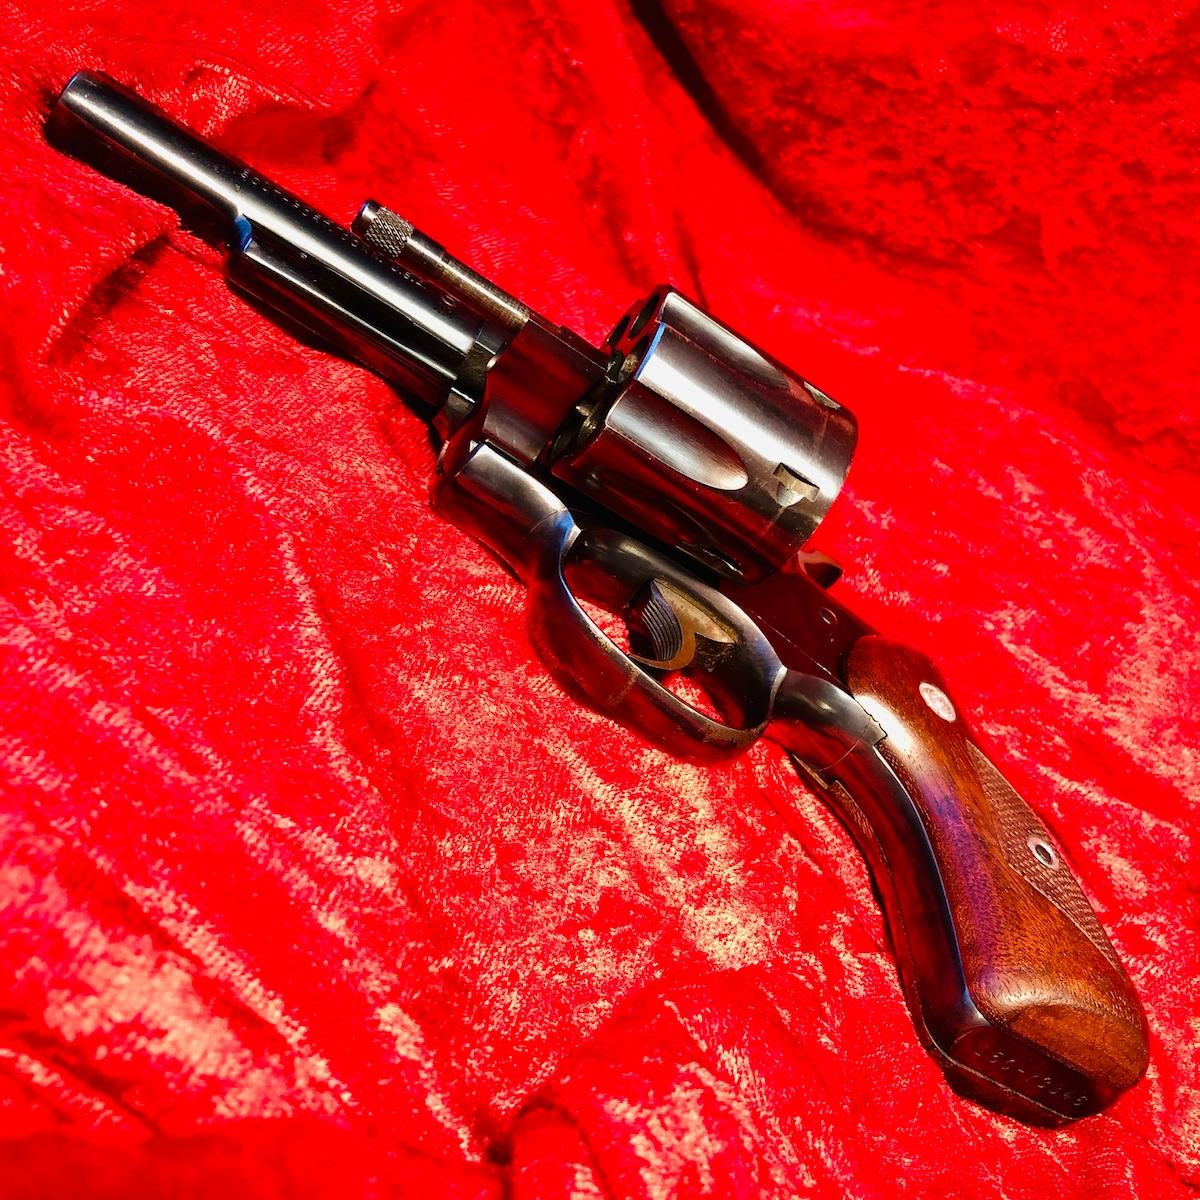 STURM, RUGER & CO., INC. Speed-Six 357 Magnum Pistol